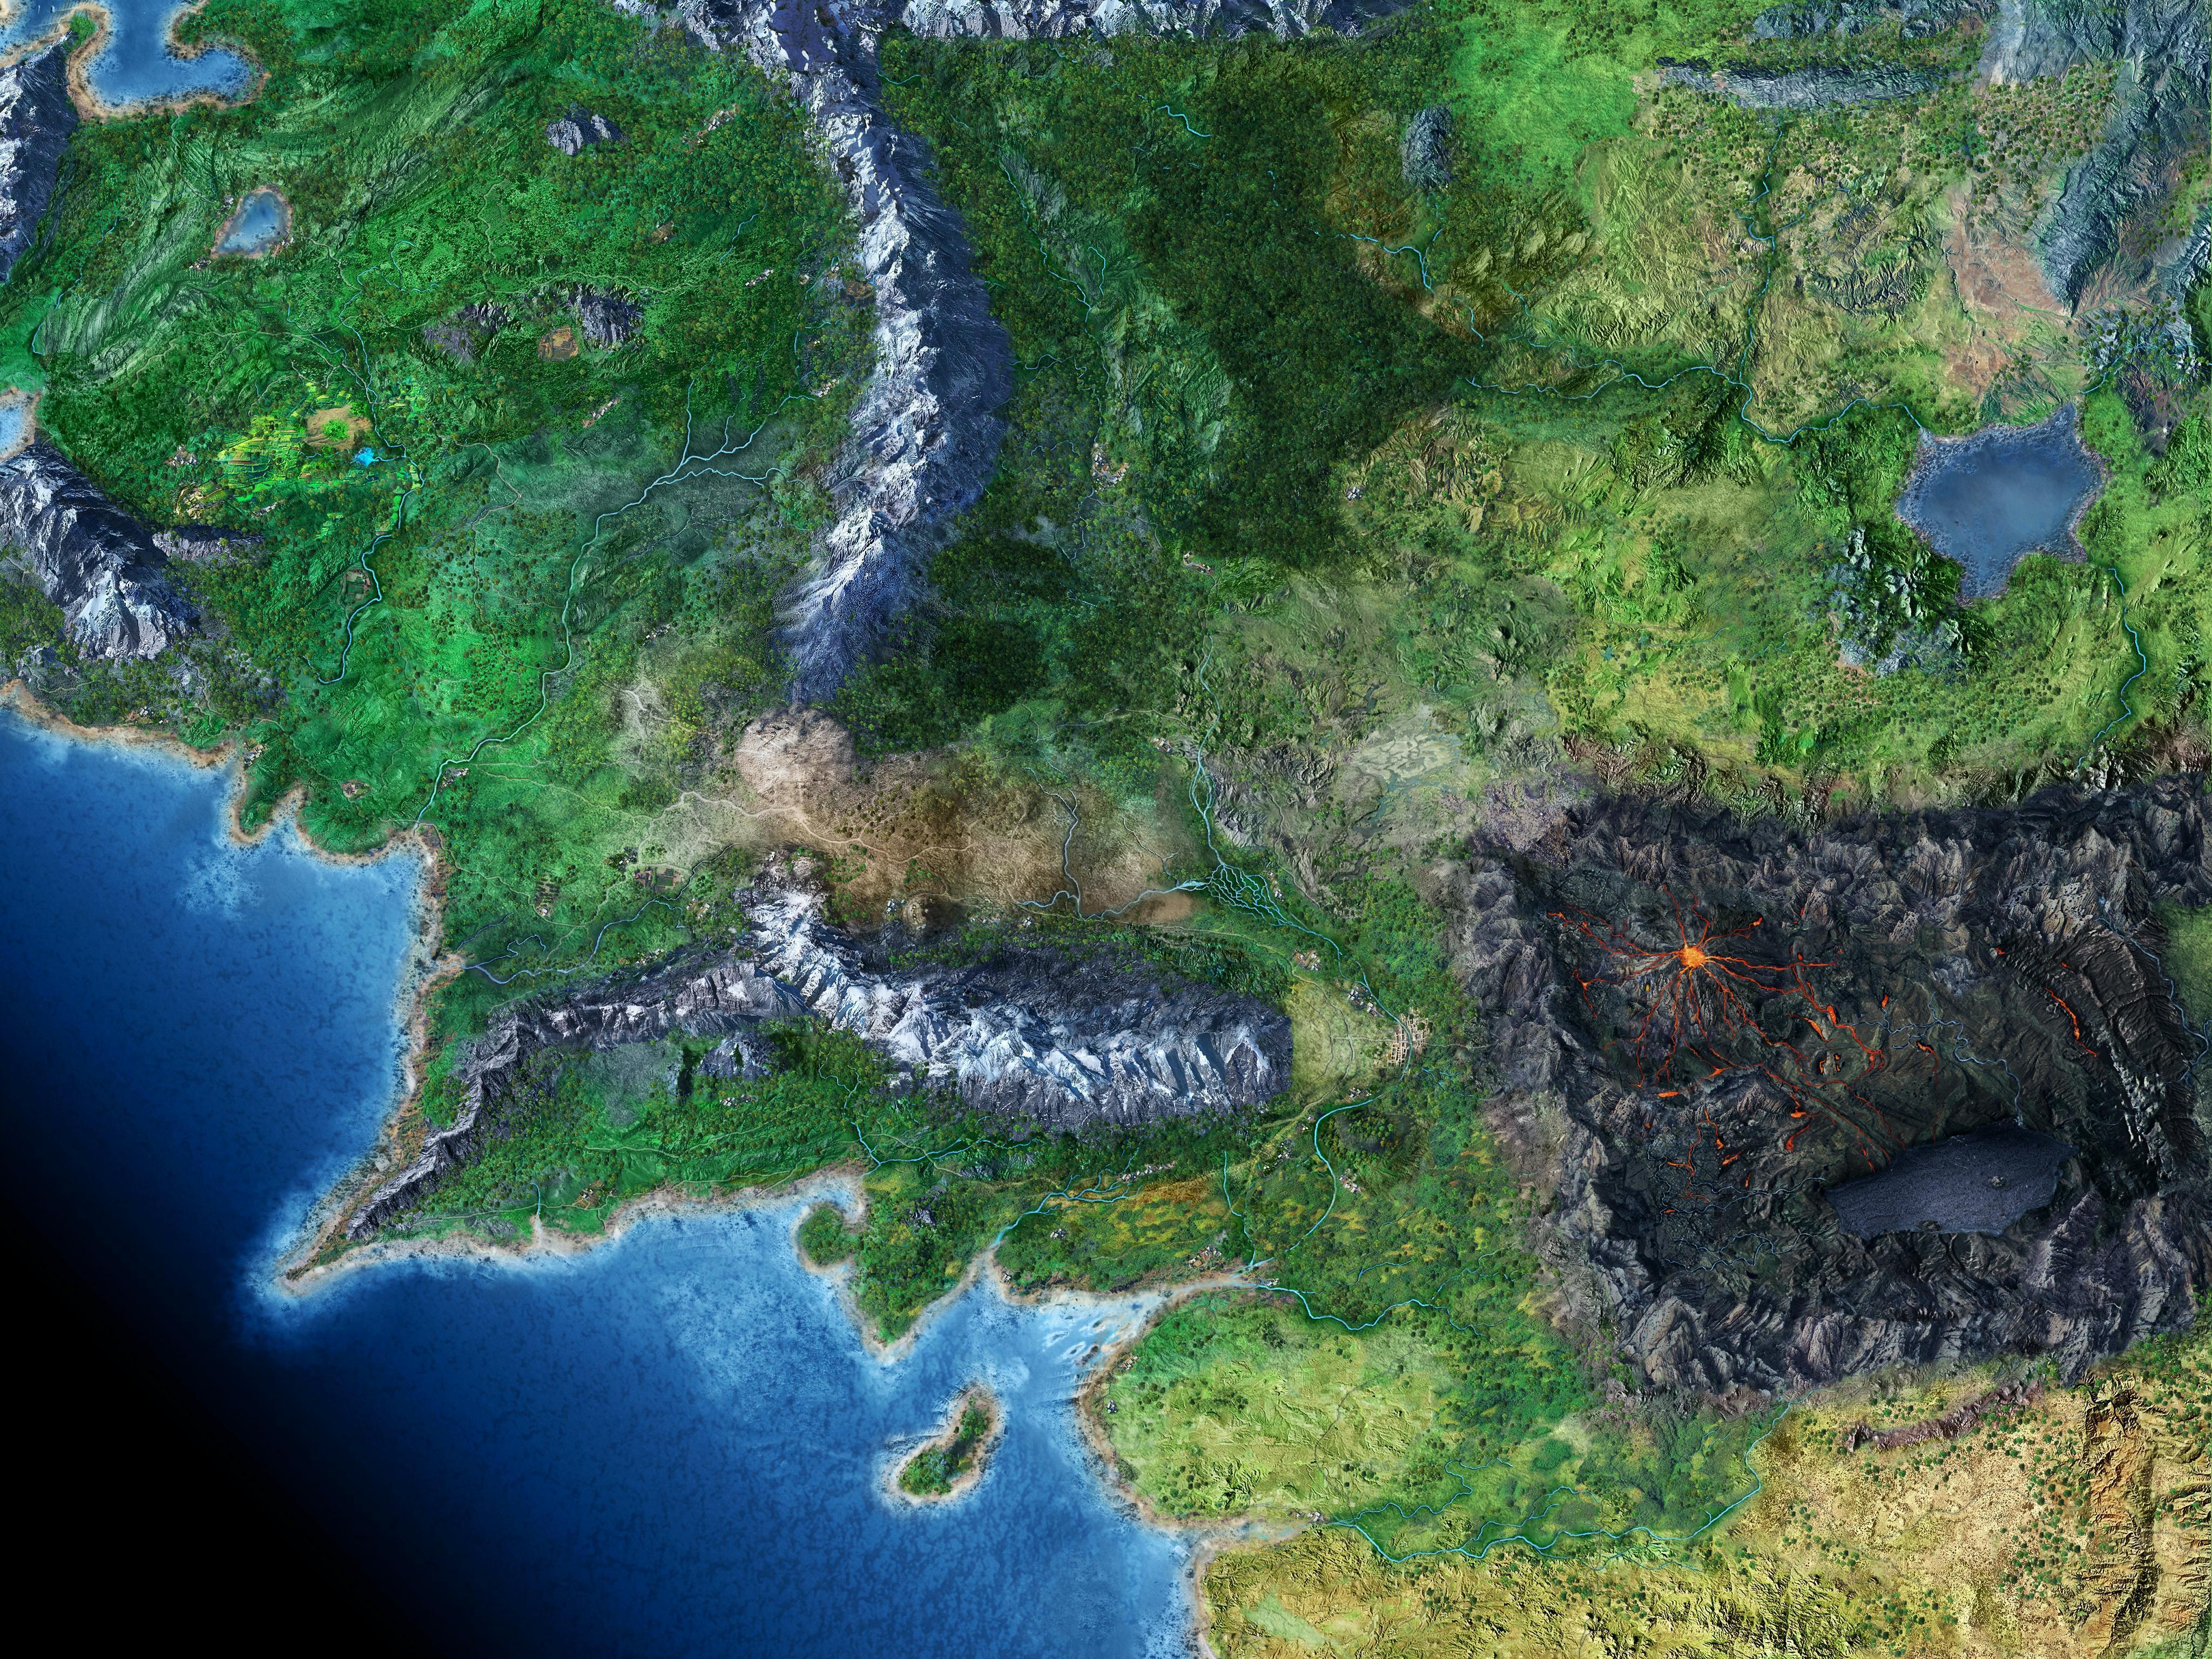 középfölde térkép Térkép: Középfölde térképe (kép) középfölde térkép